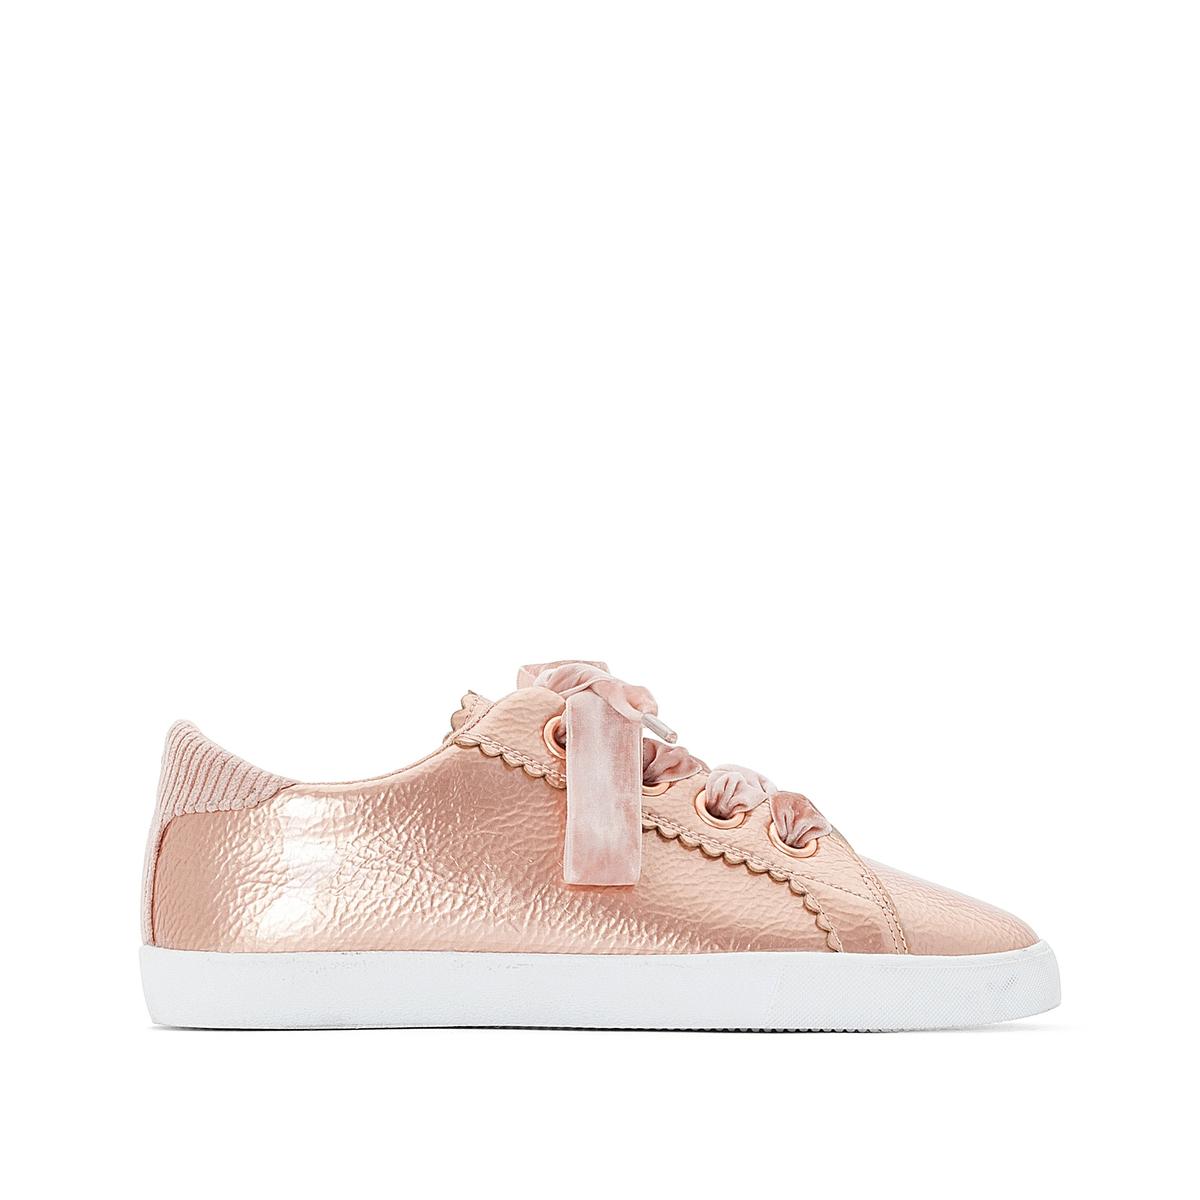 Кеды на шнуровке из розового текстиля, на широкую стопу 38-45 балетки на шнуровке